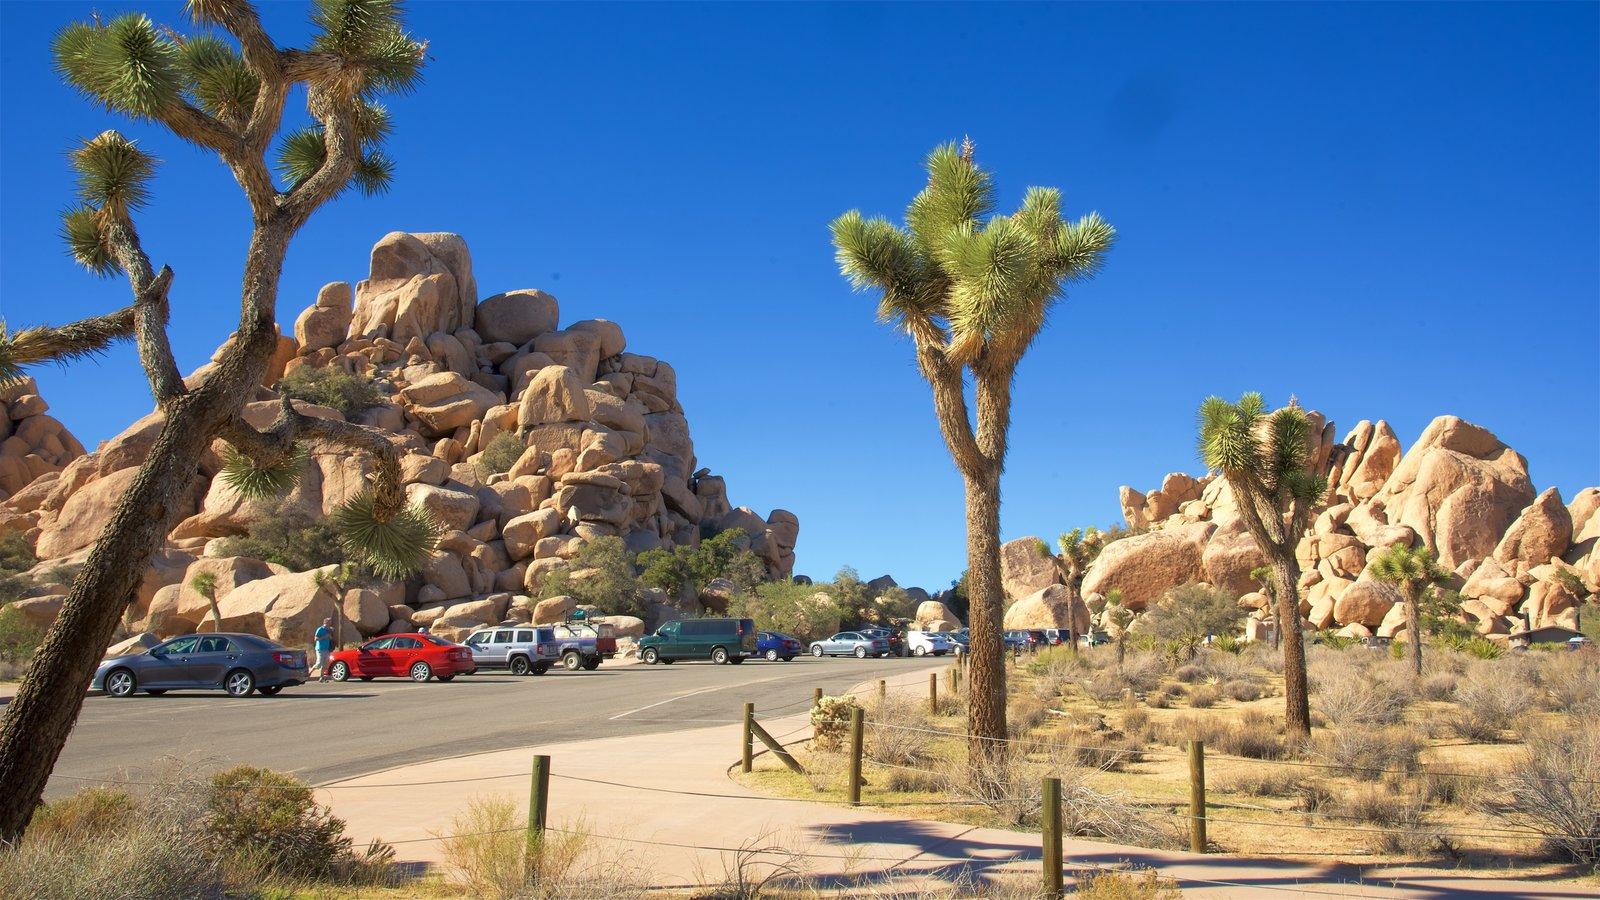 Parque Nacional de Joshua Tree caracterizando paisagens do deserto